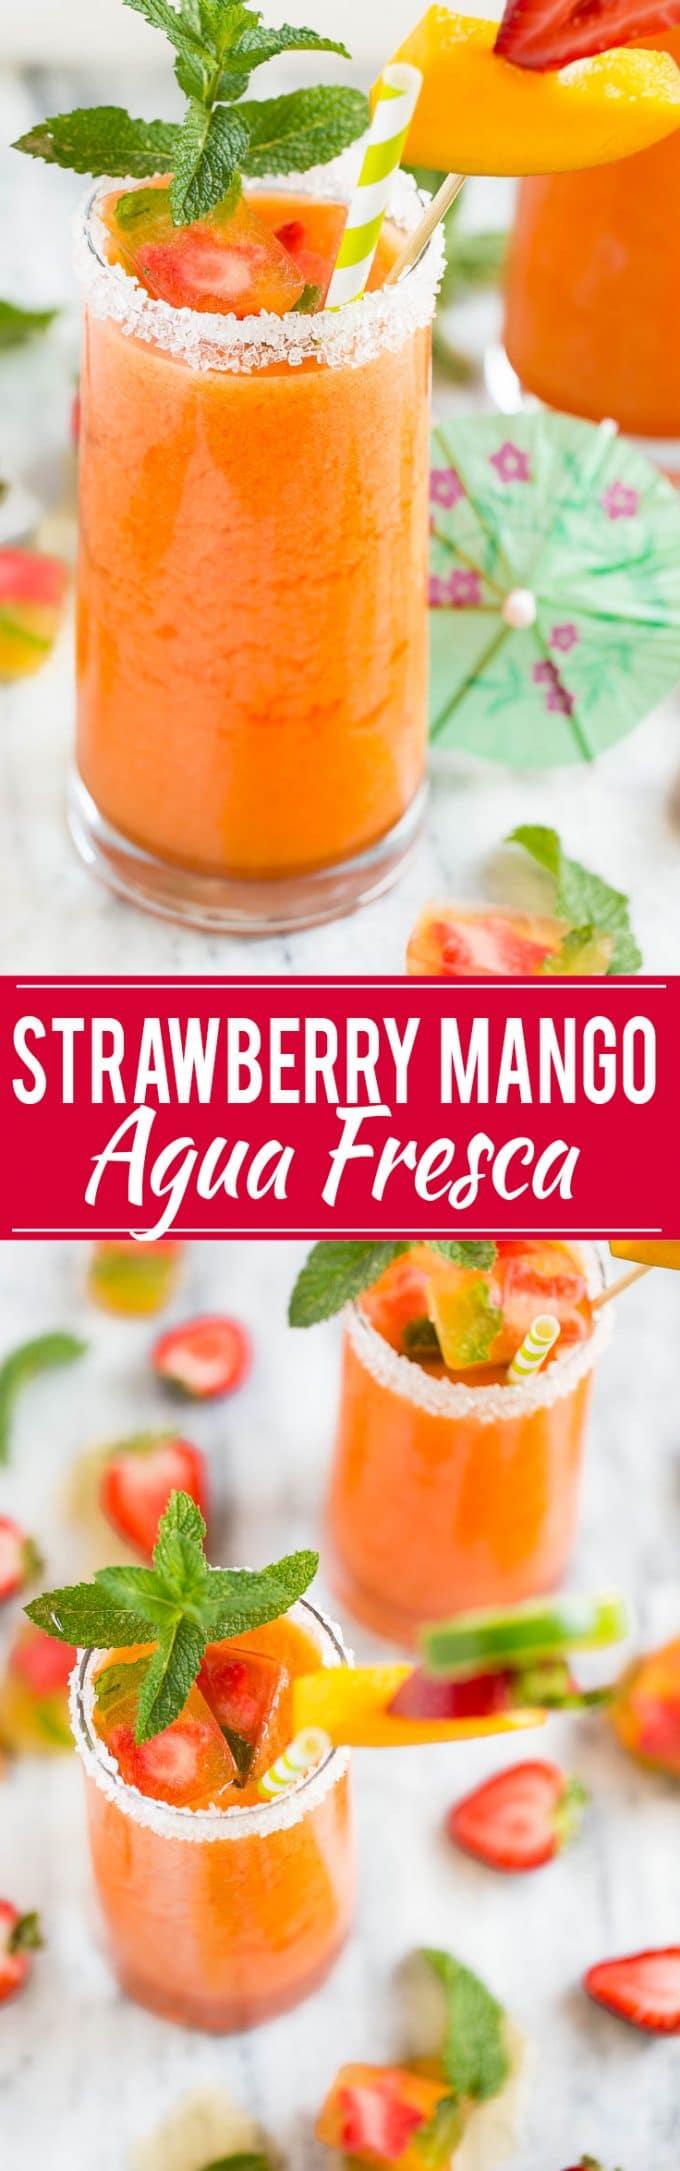 Strawberry Mango Agua Fresca | Strawberry Agua Fresca | Mango Agua Fresca | Summer Agua Fresca | Best Agua Fresca | Easy Agua Fresca